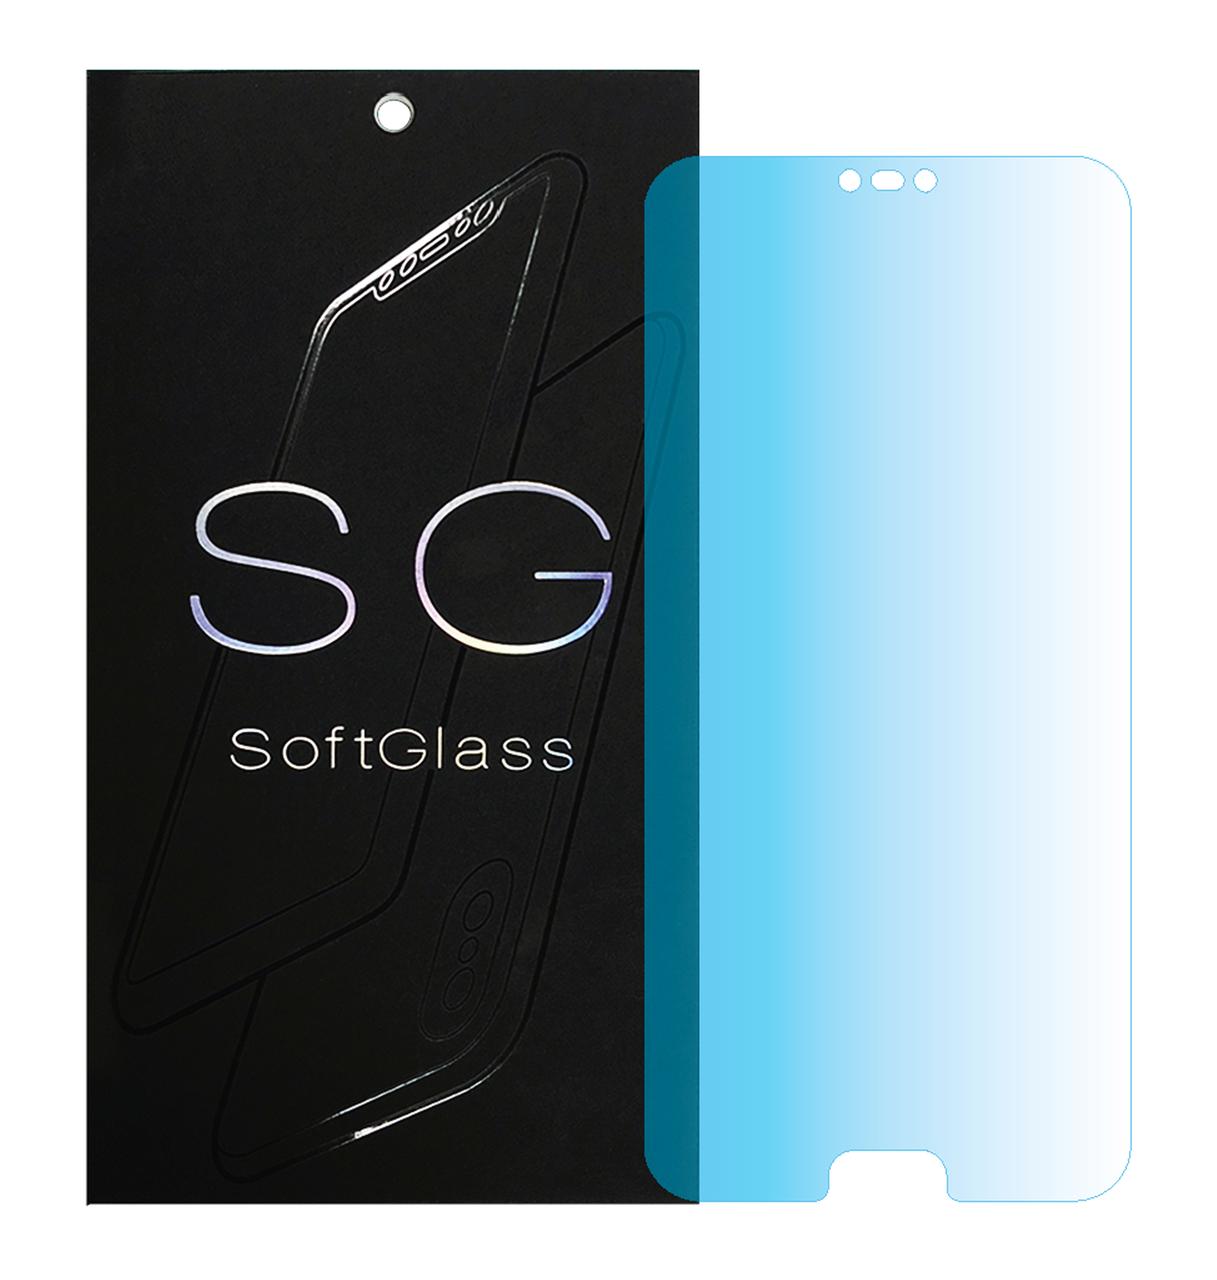 Поліуретанова плівка Honor 10 2018 SoftGlass Екран